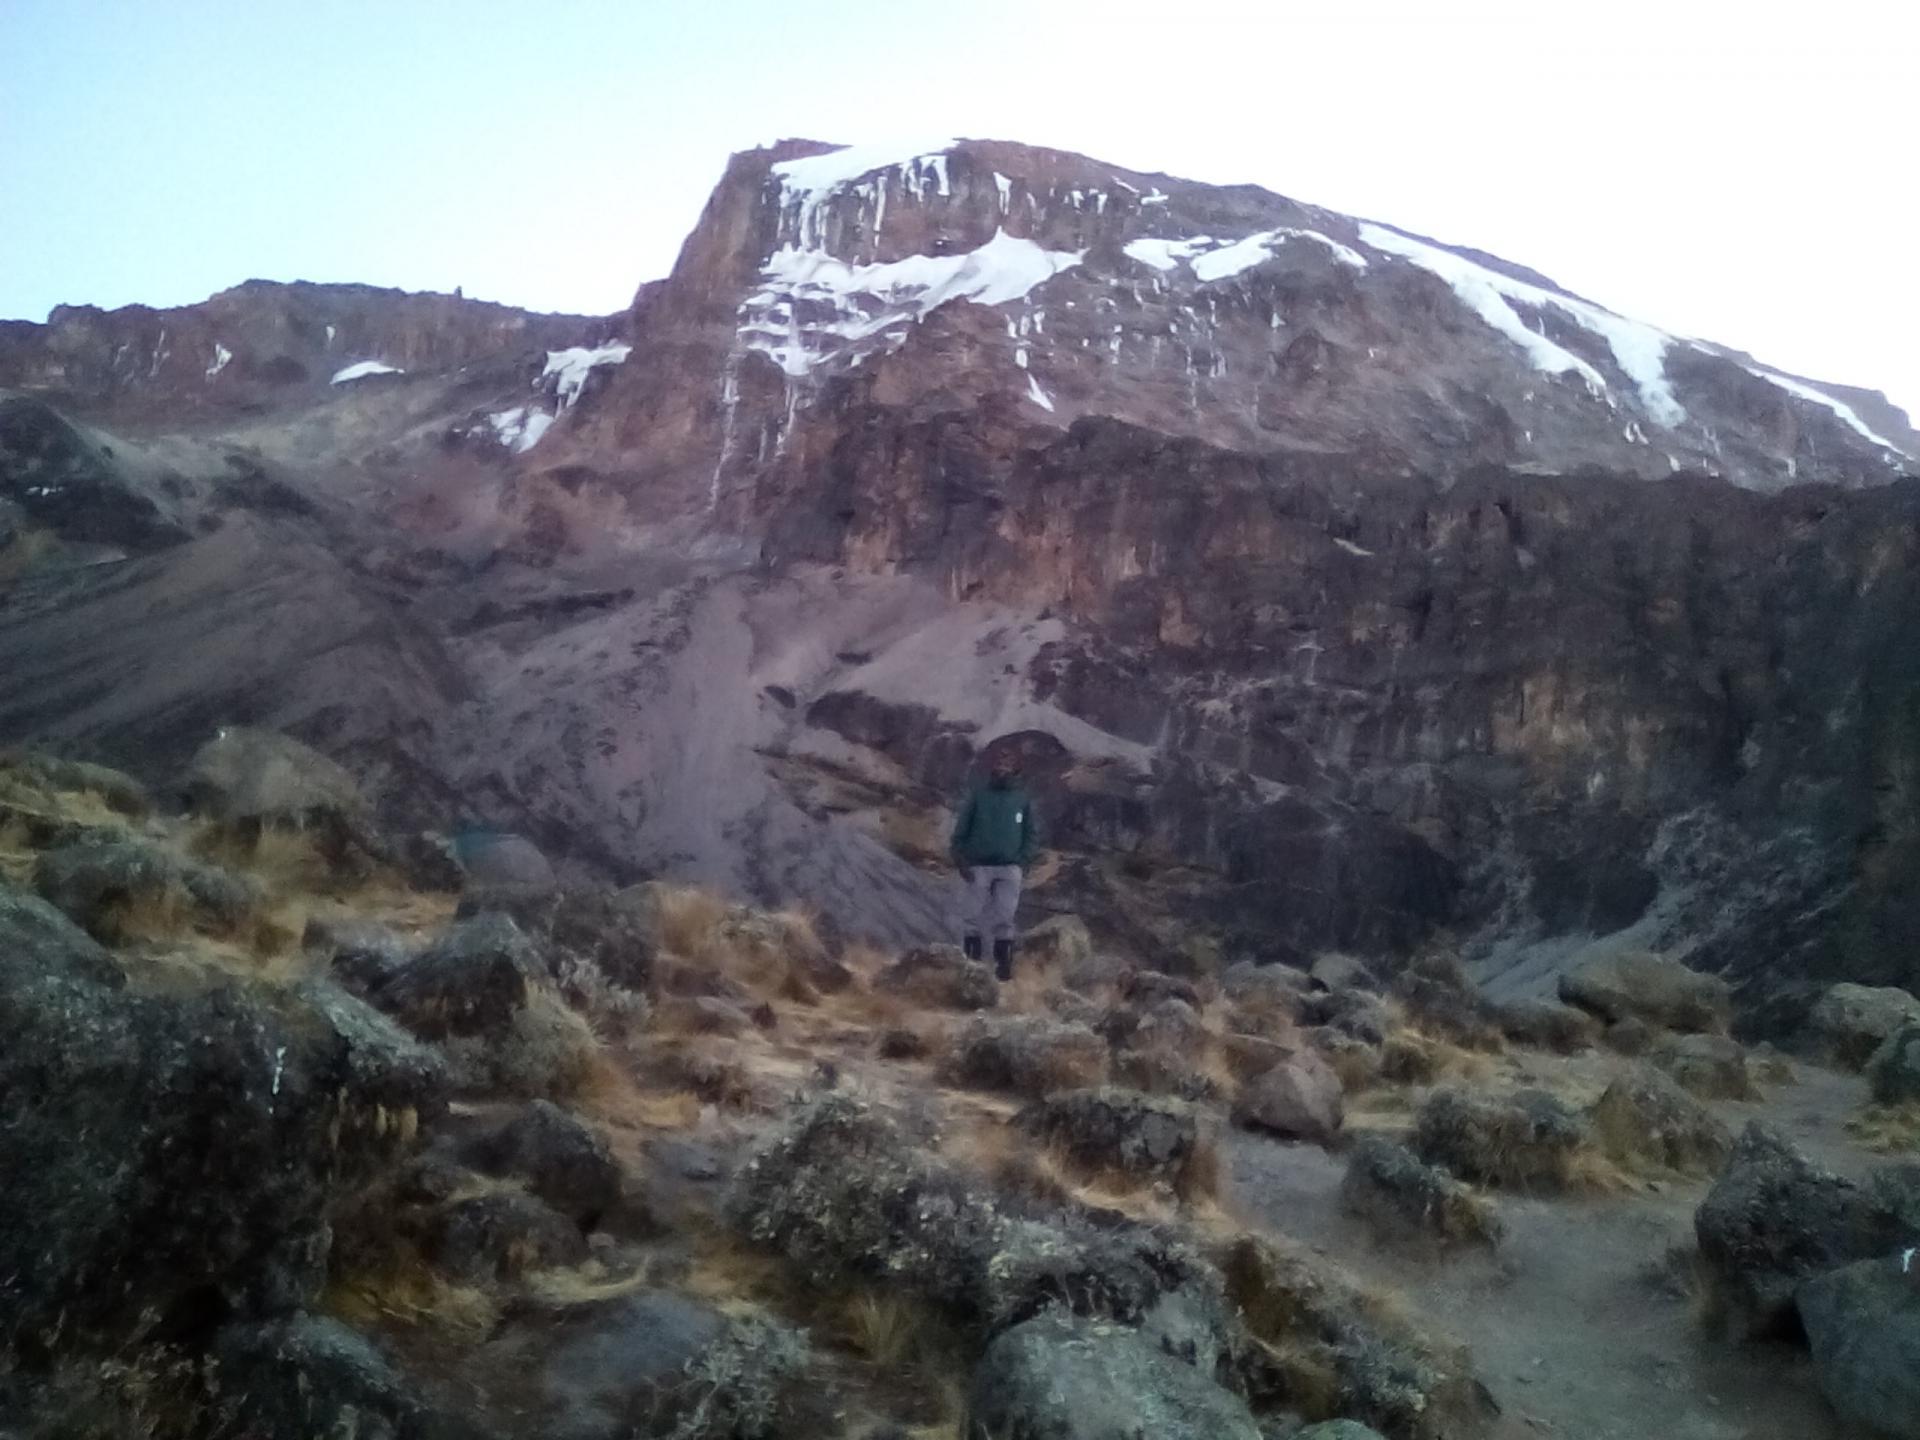 small group adventures,mountain adventures,Kilimanjaro, mount kilimanjaro, climb kilimanjaro, kilimanjaro routes,climbing mount kilimanjaro,trekking kilimanjaro,kilimanjaro summit